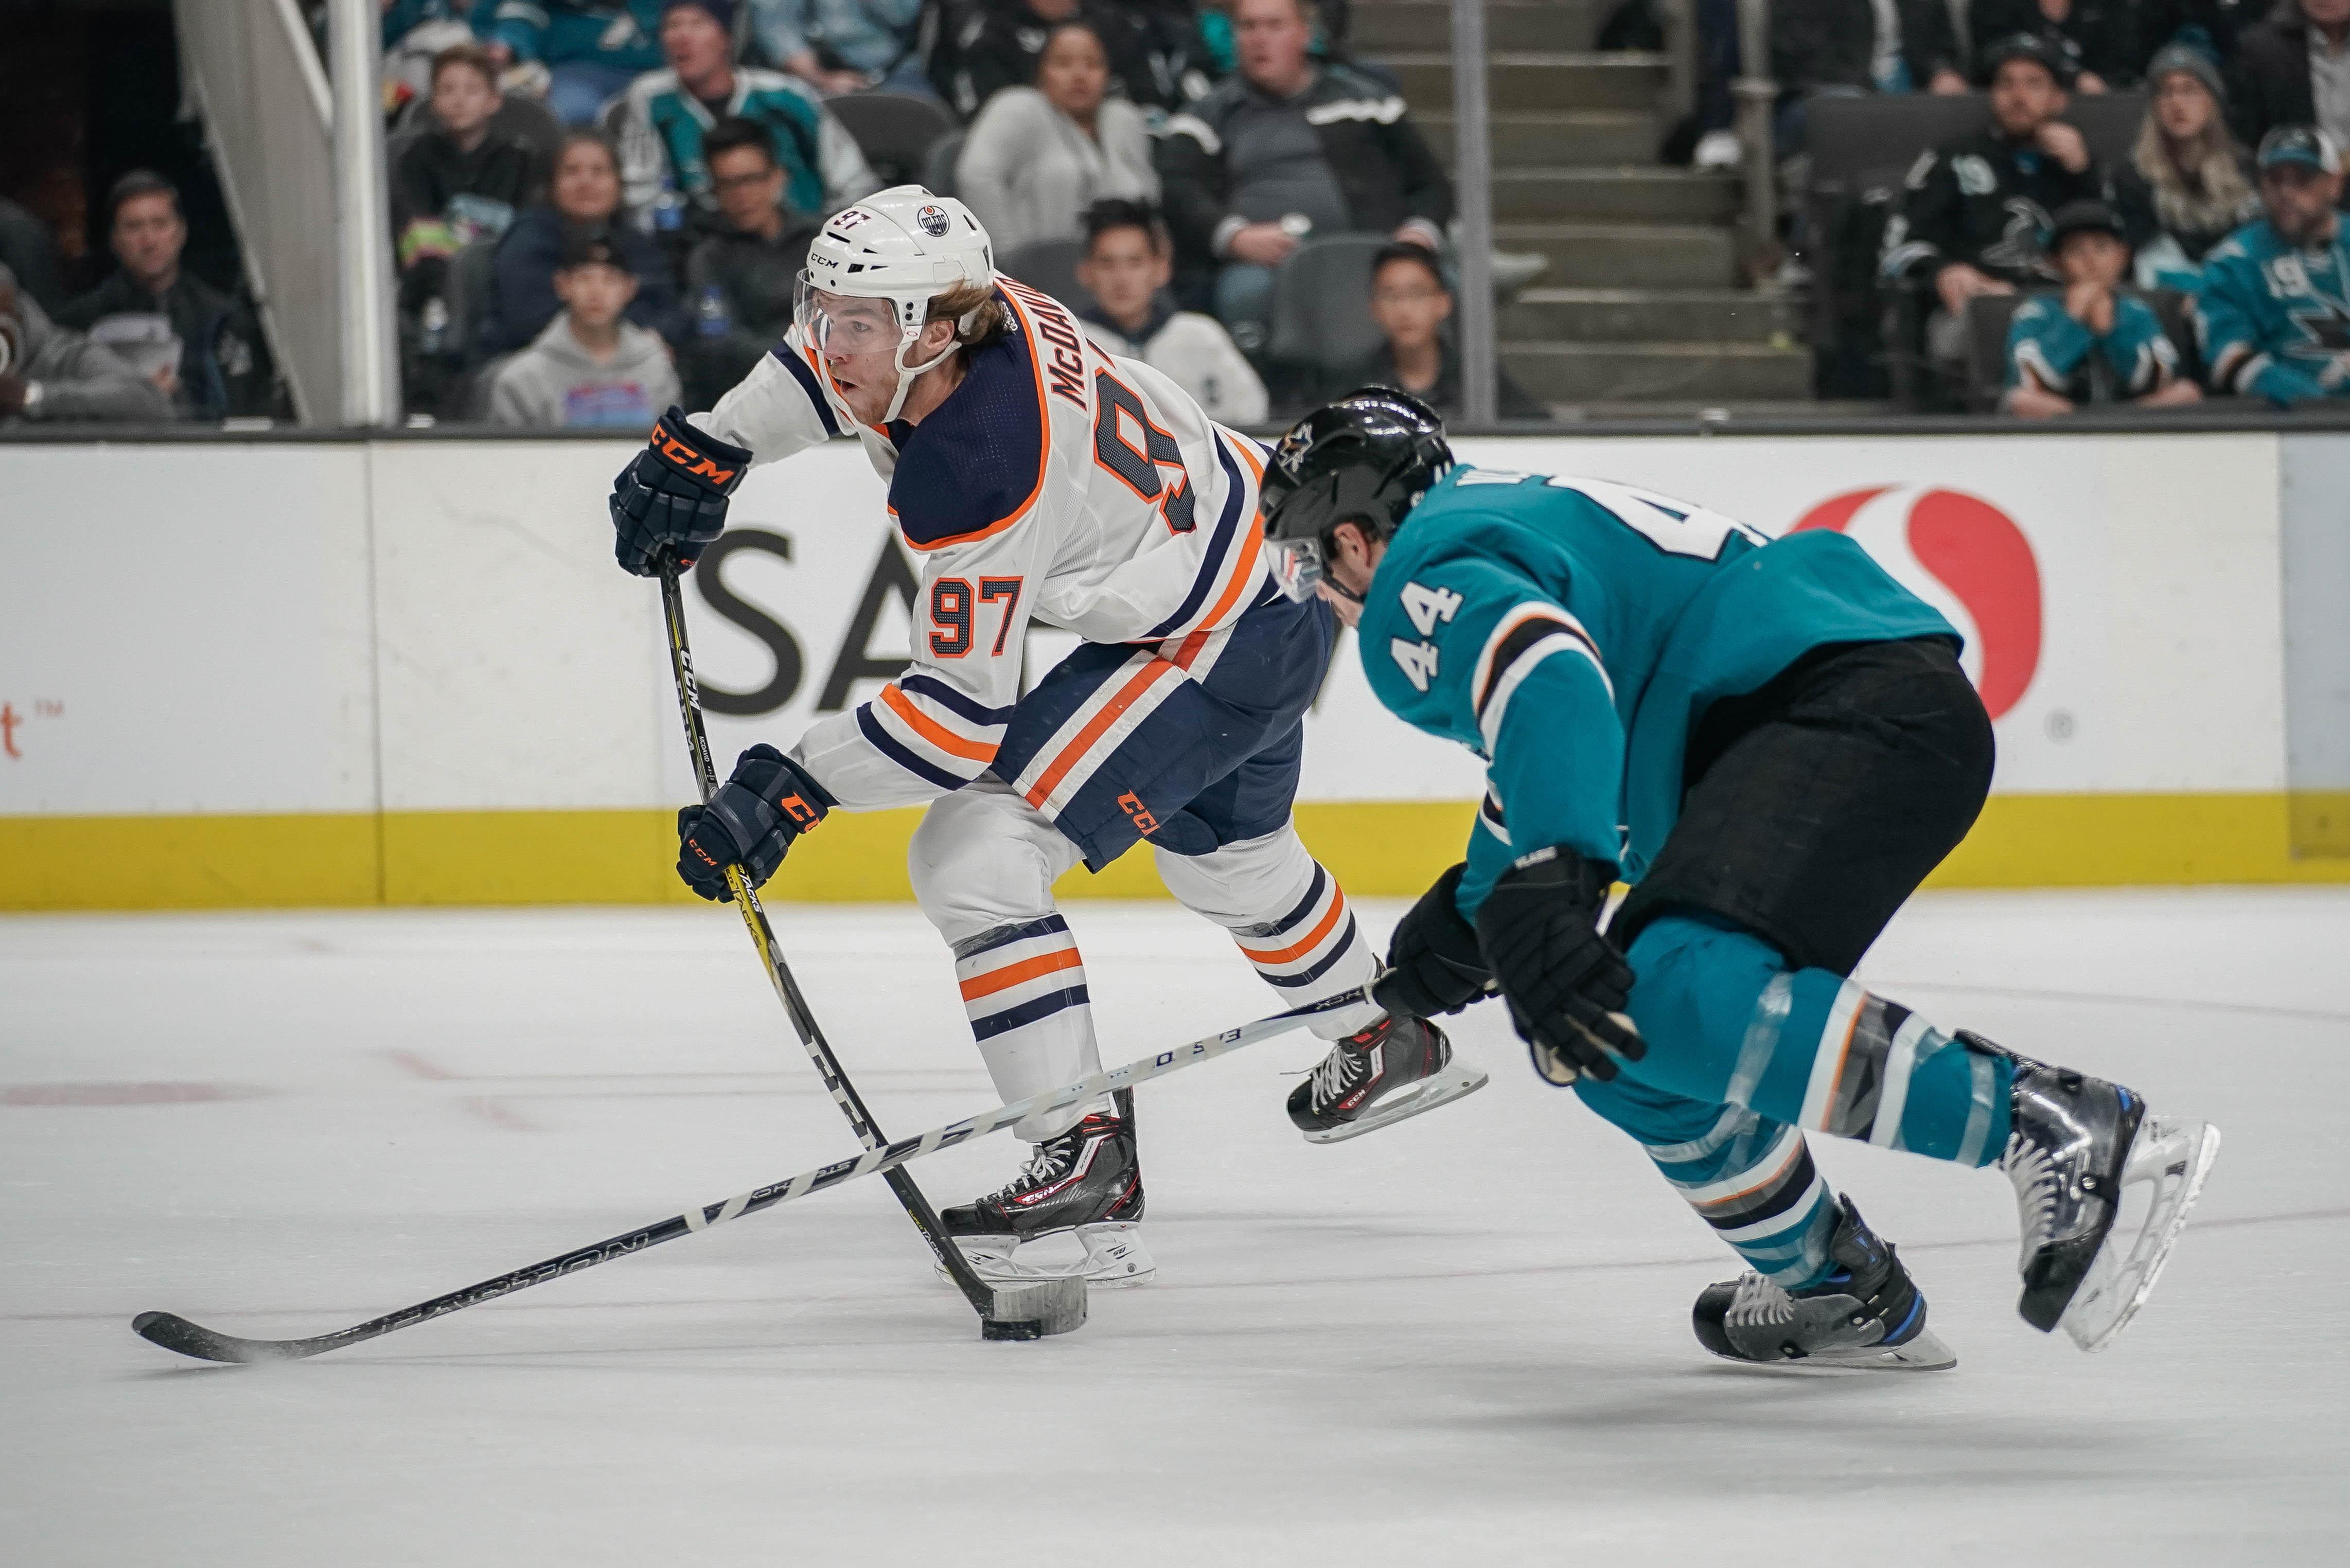 Nov 20, 2018; San Jose, CA, USA; Edmonton Oilers center Connor McDavid (97) controls the puck against San Jose Sharks defenseman Marc-Edouard Vlasic (44) during the first period at SAP Center at San Jose. Mandatory Credit: Stan Szeto